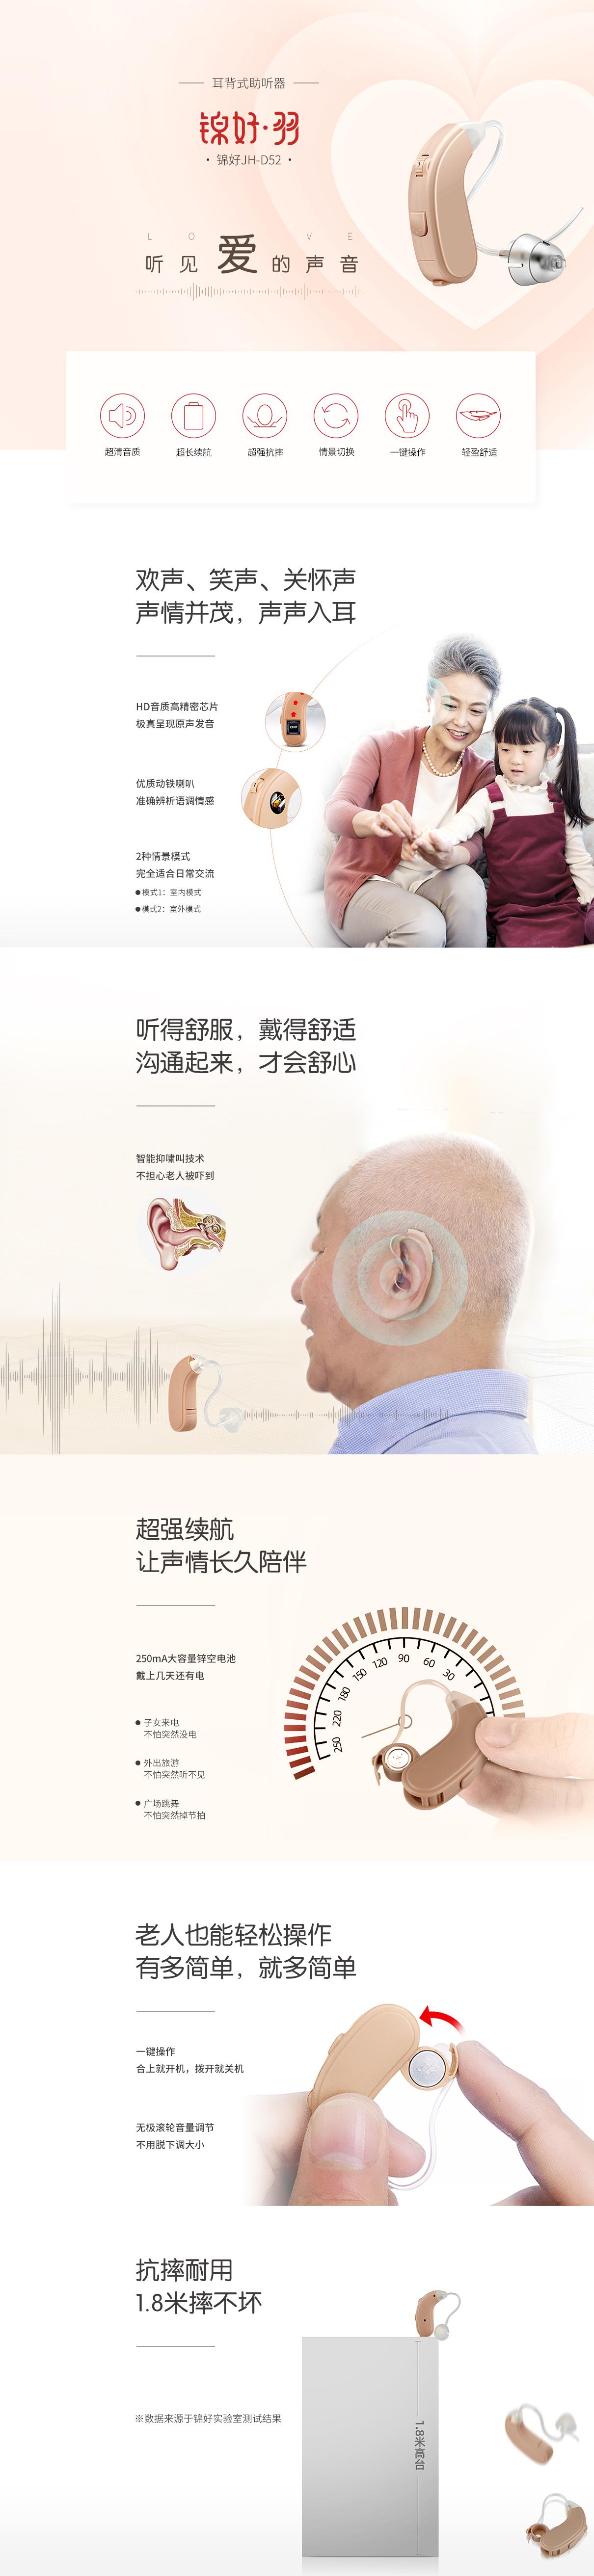 JH-D52 助听器